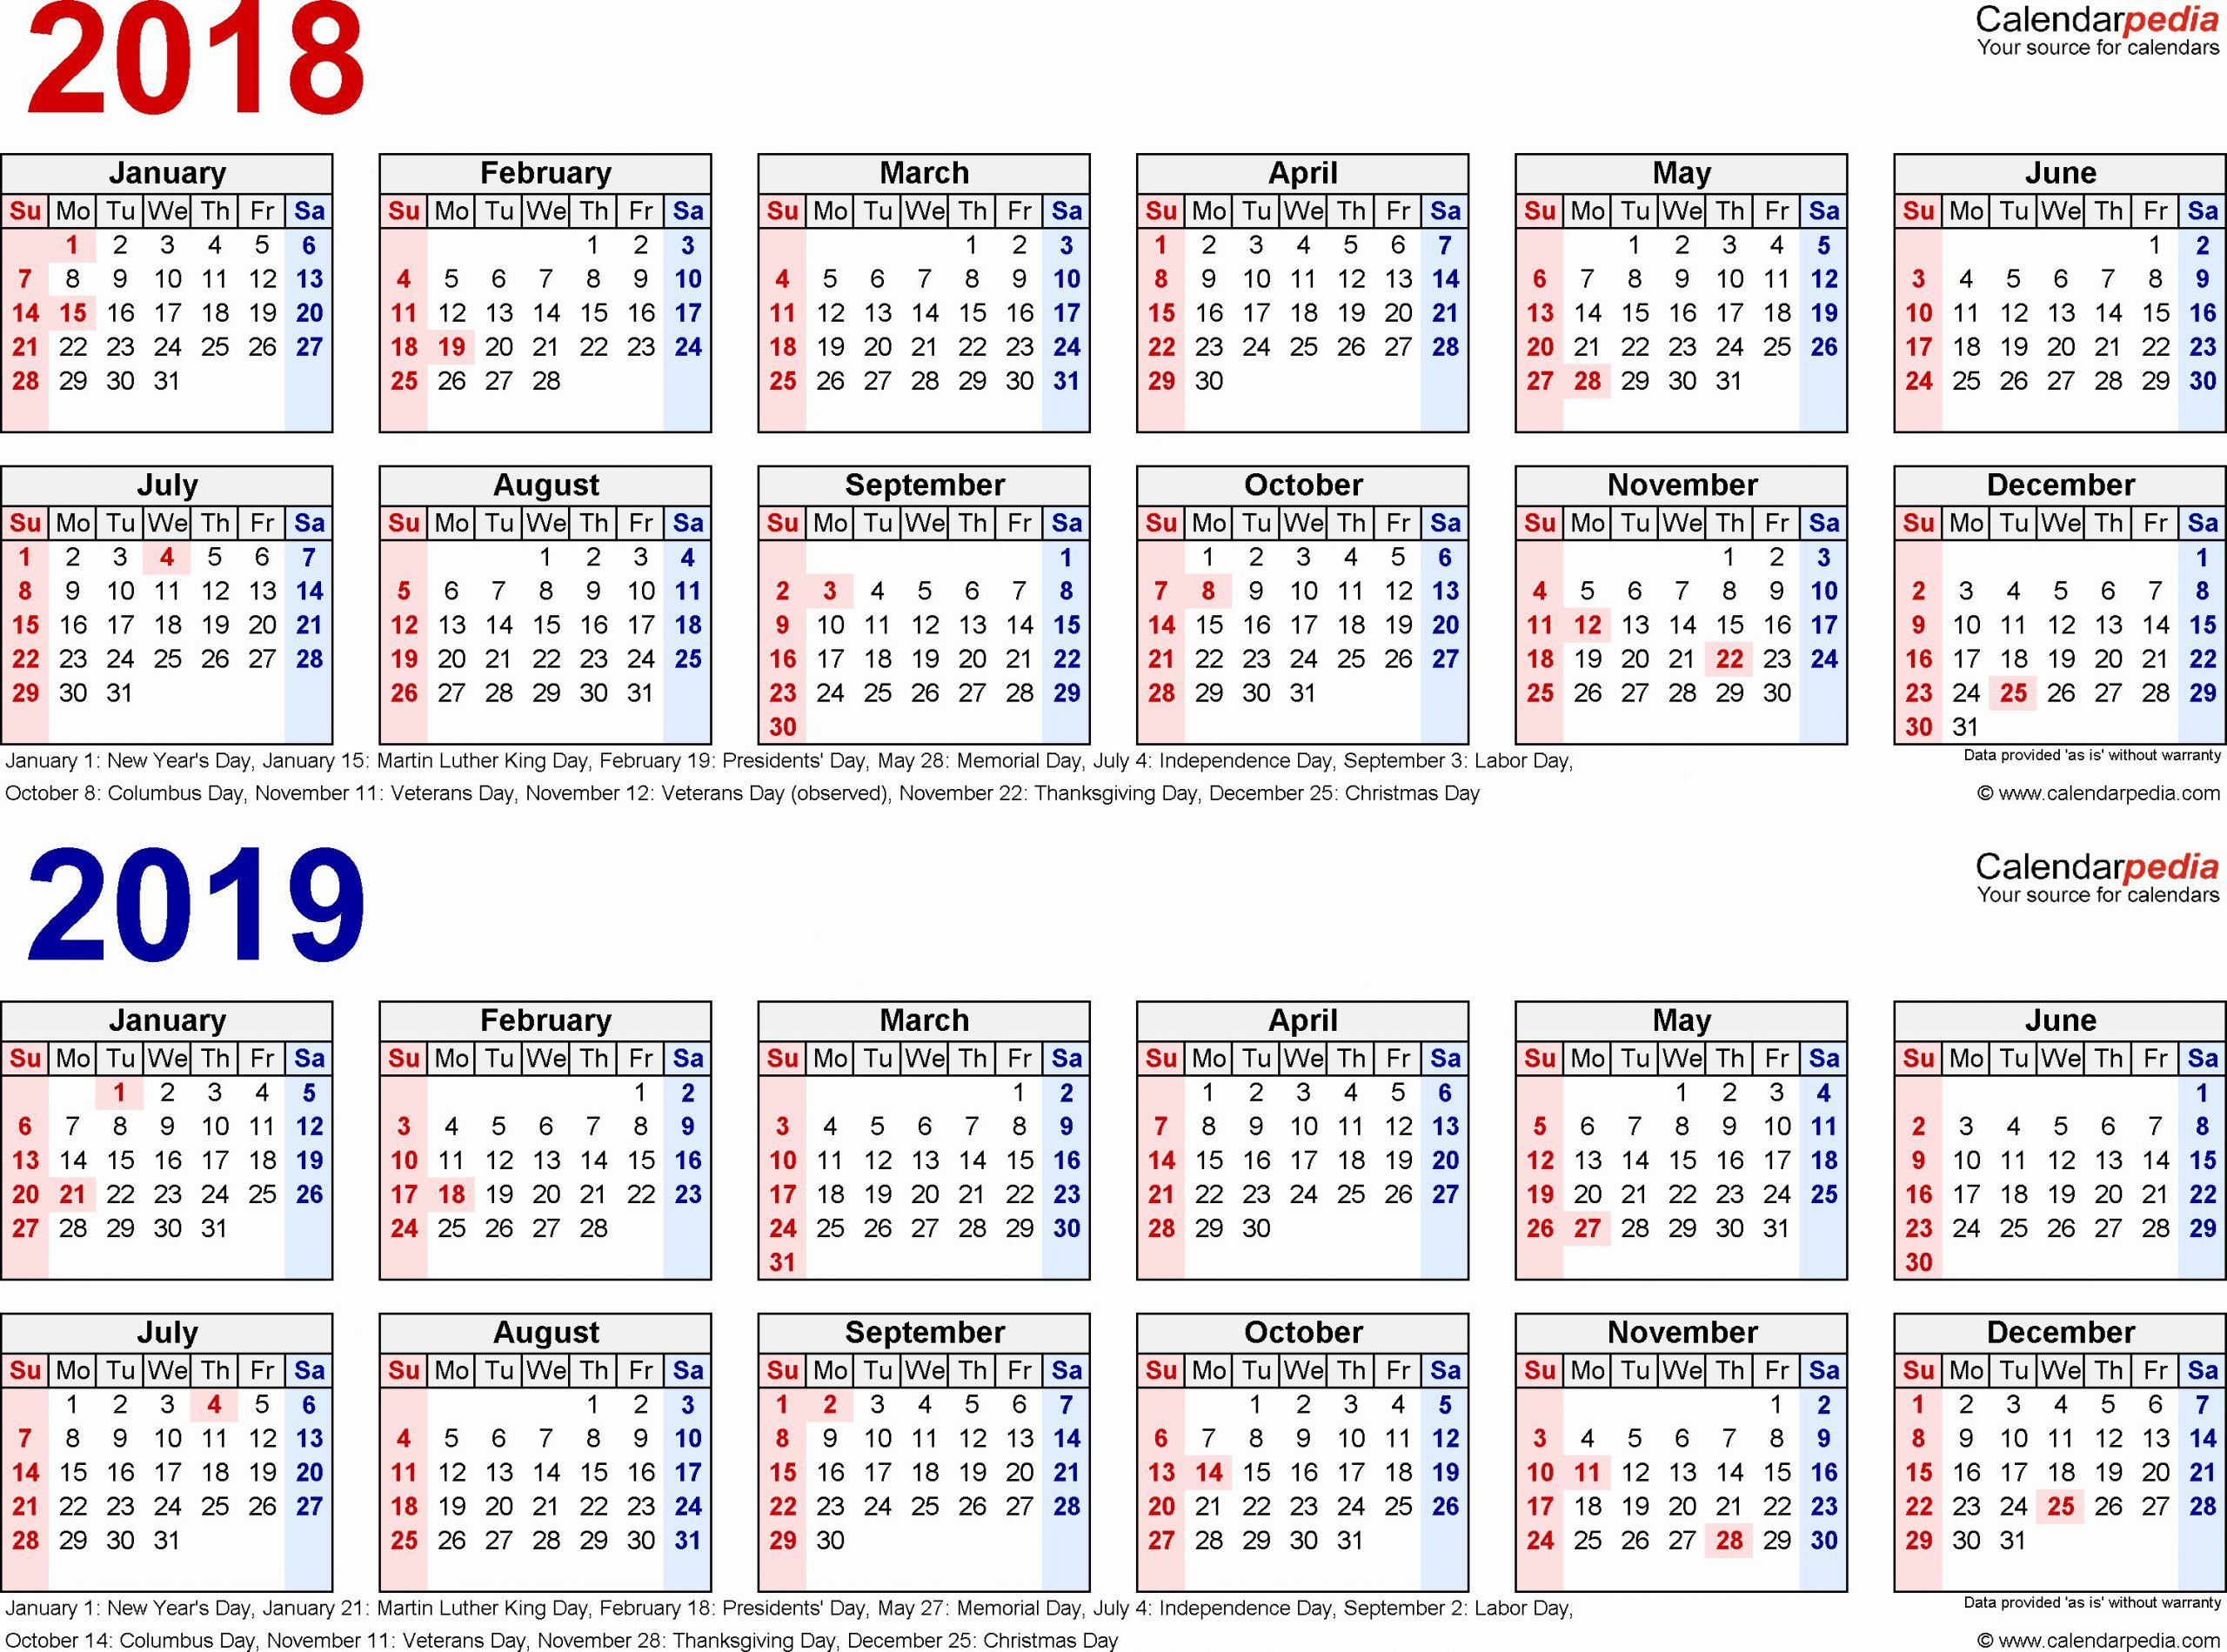 2019 Biweekly Payroll Calendar Template Excel Fresh 2018